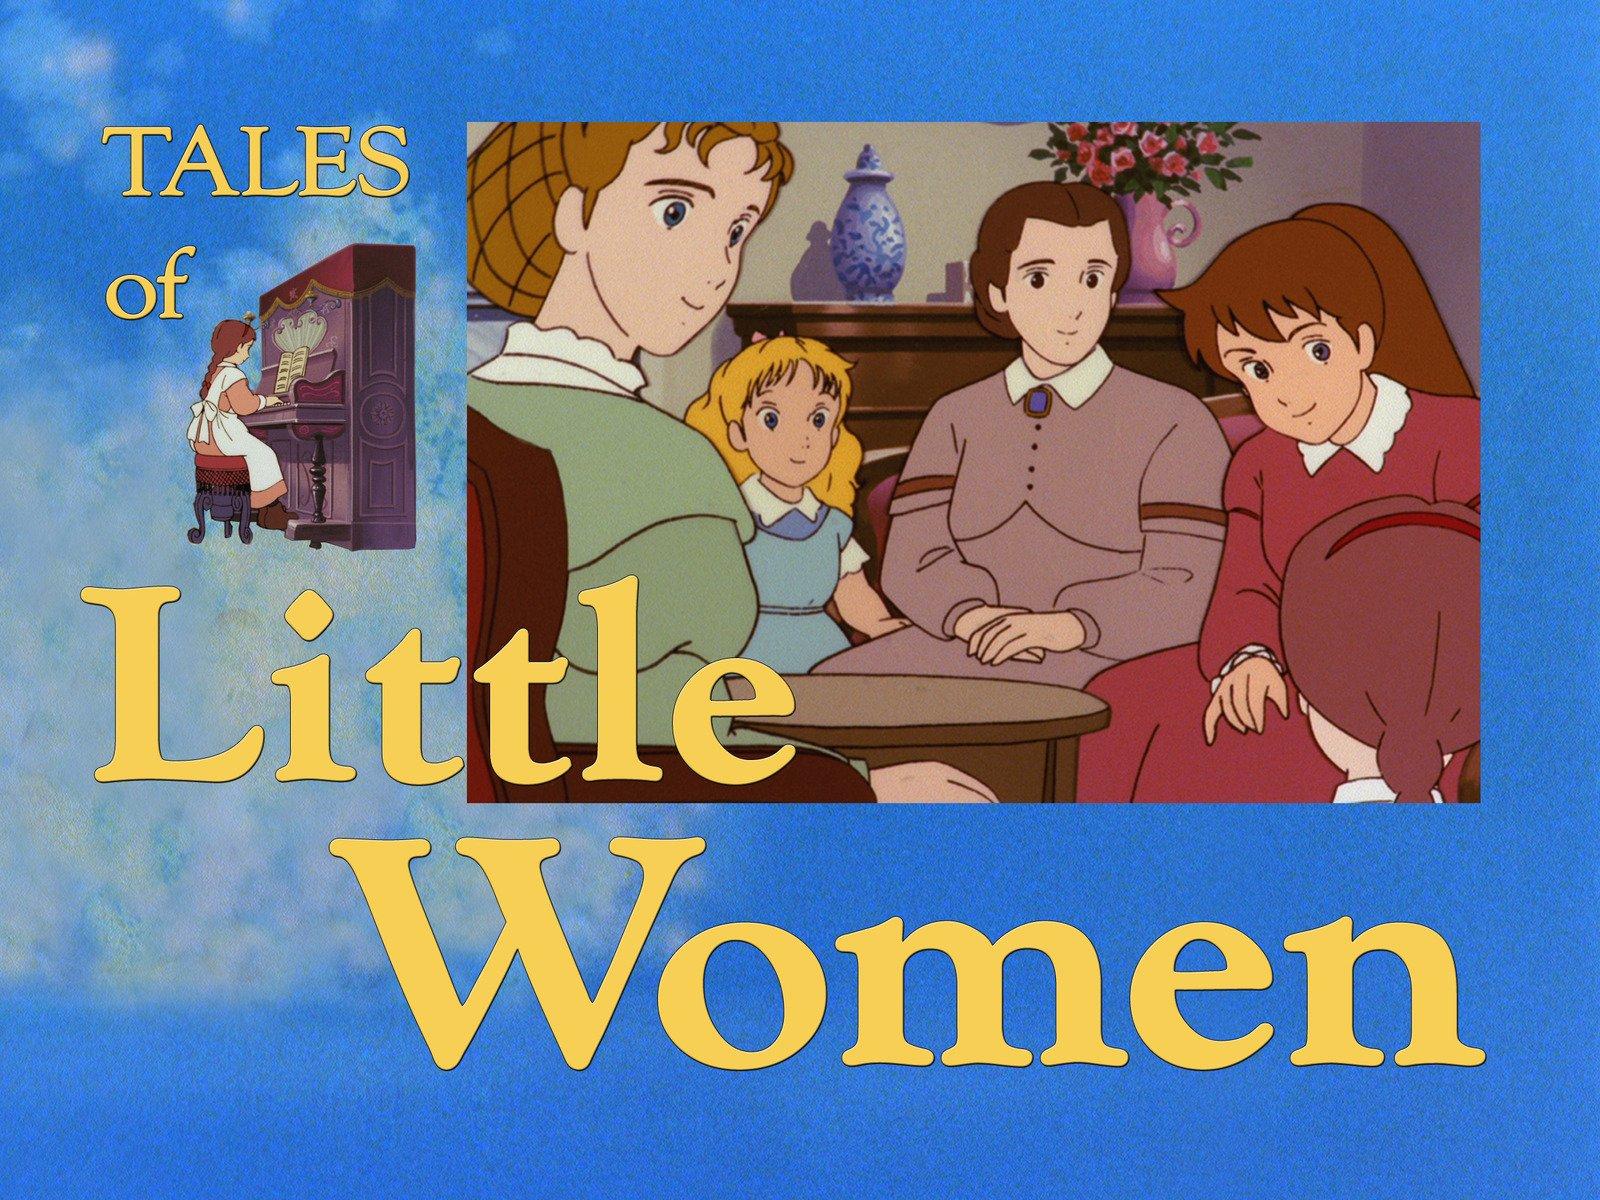 Tales Of Little Women on Amazon Prime Video UK